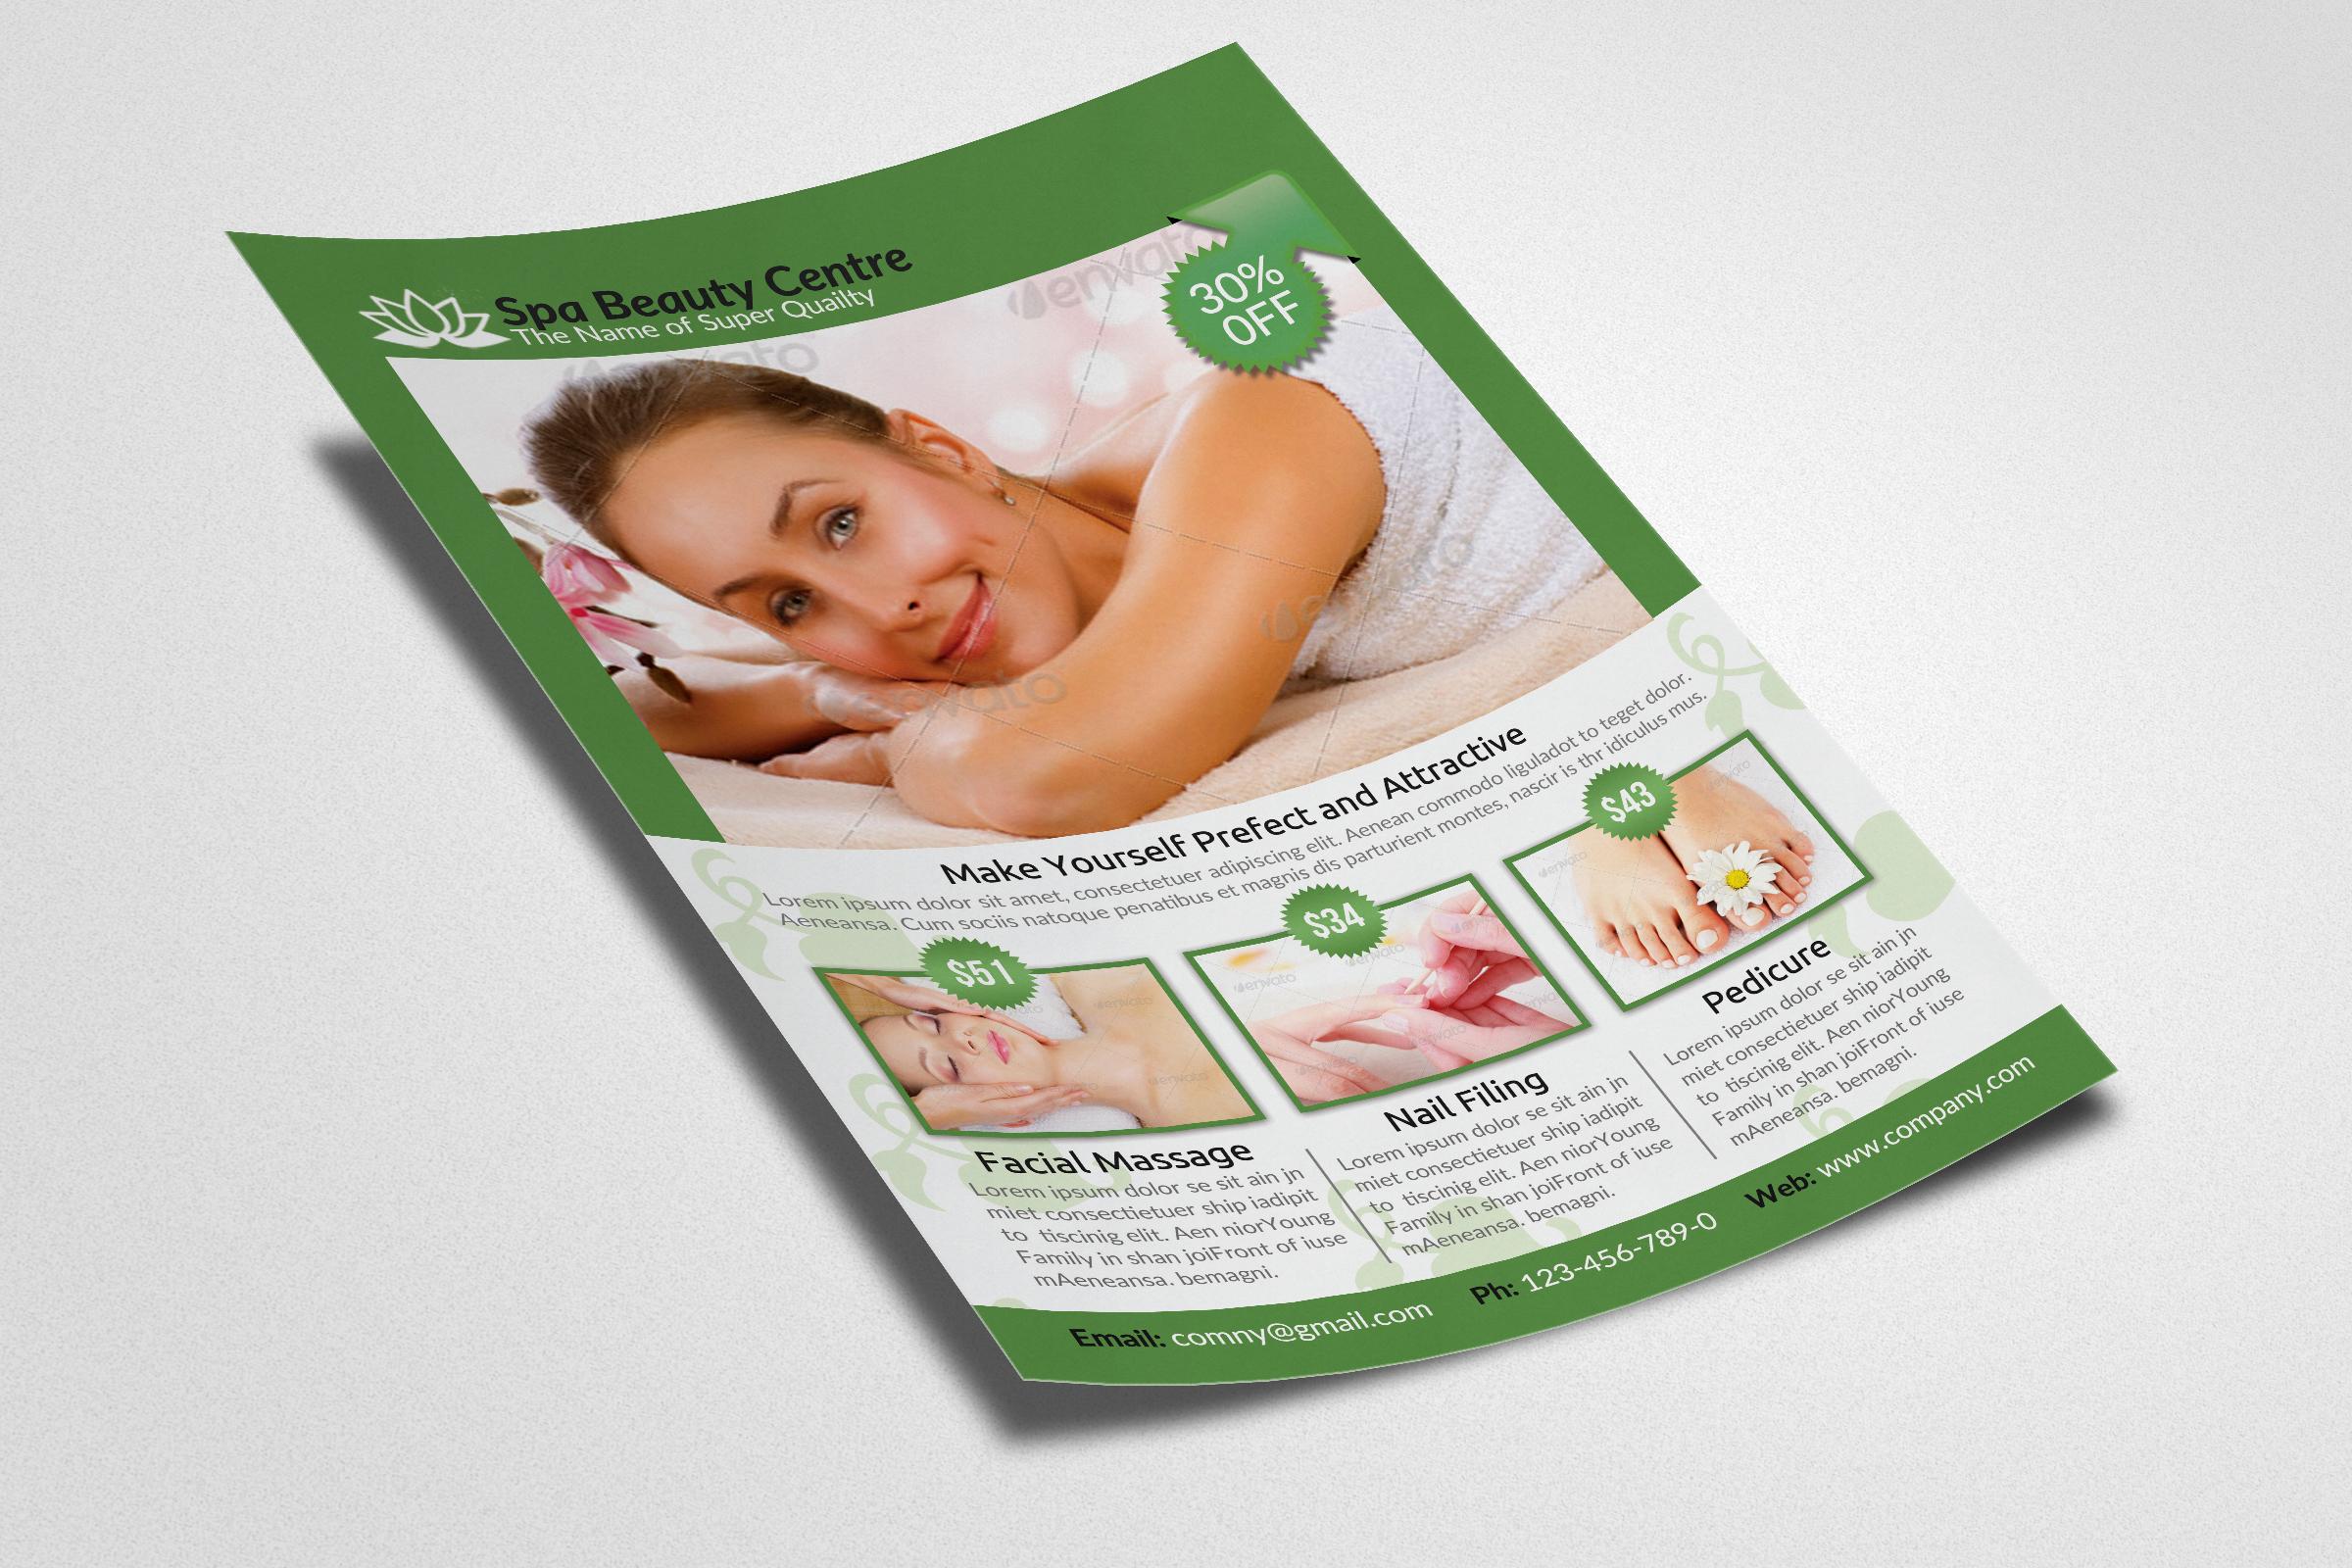 Beauty Spa & Massage Flyer example image 2